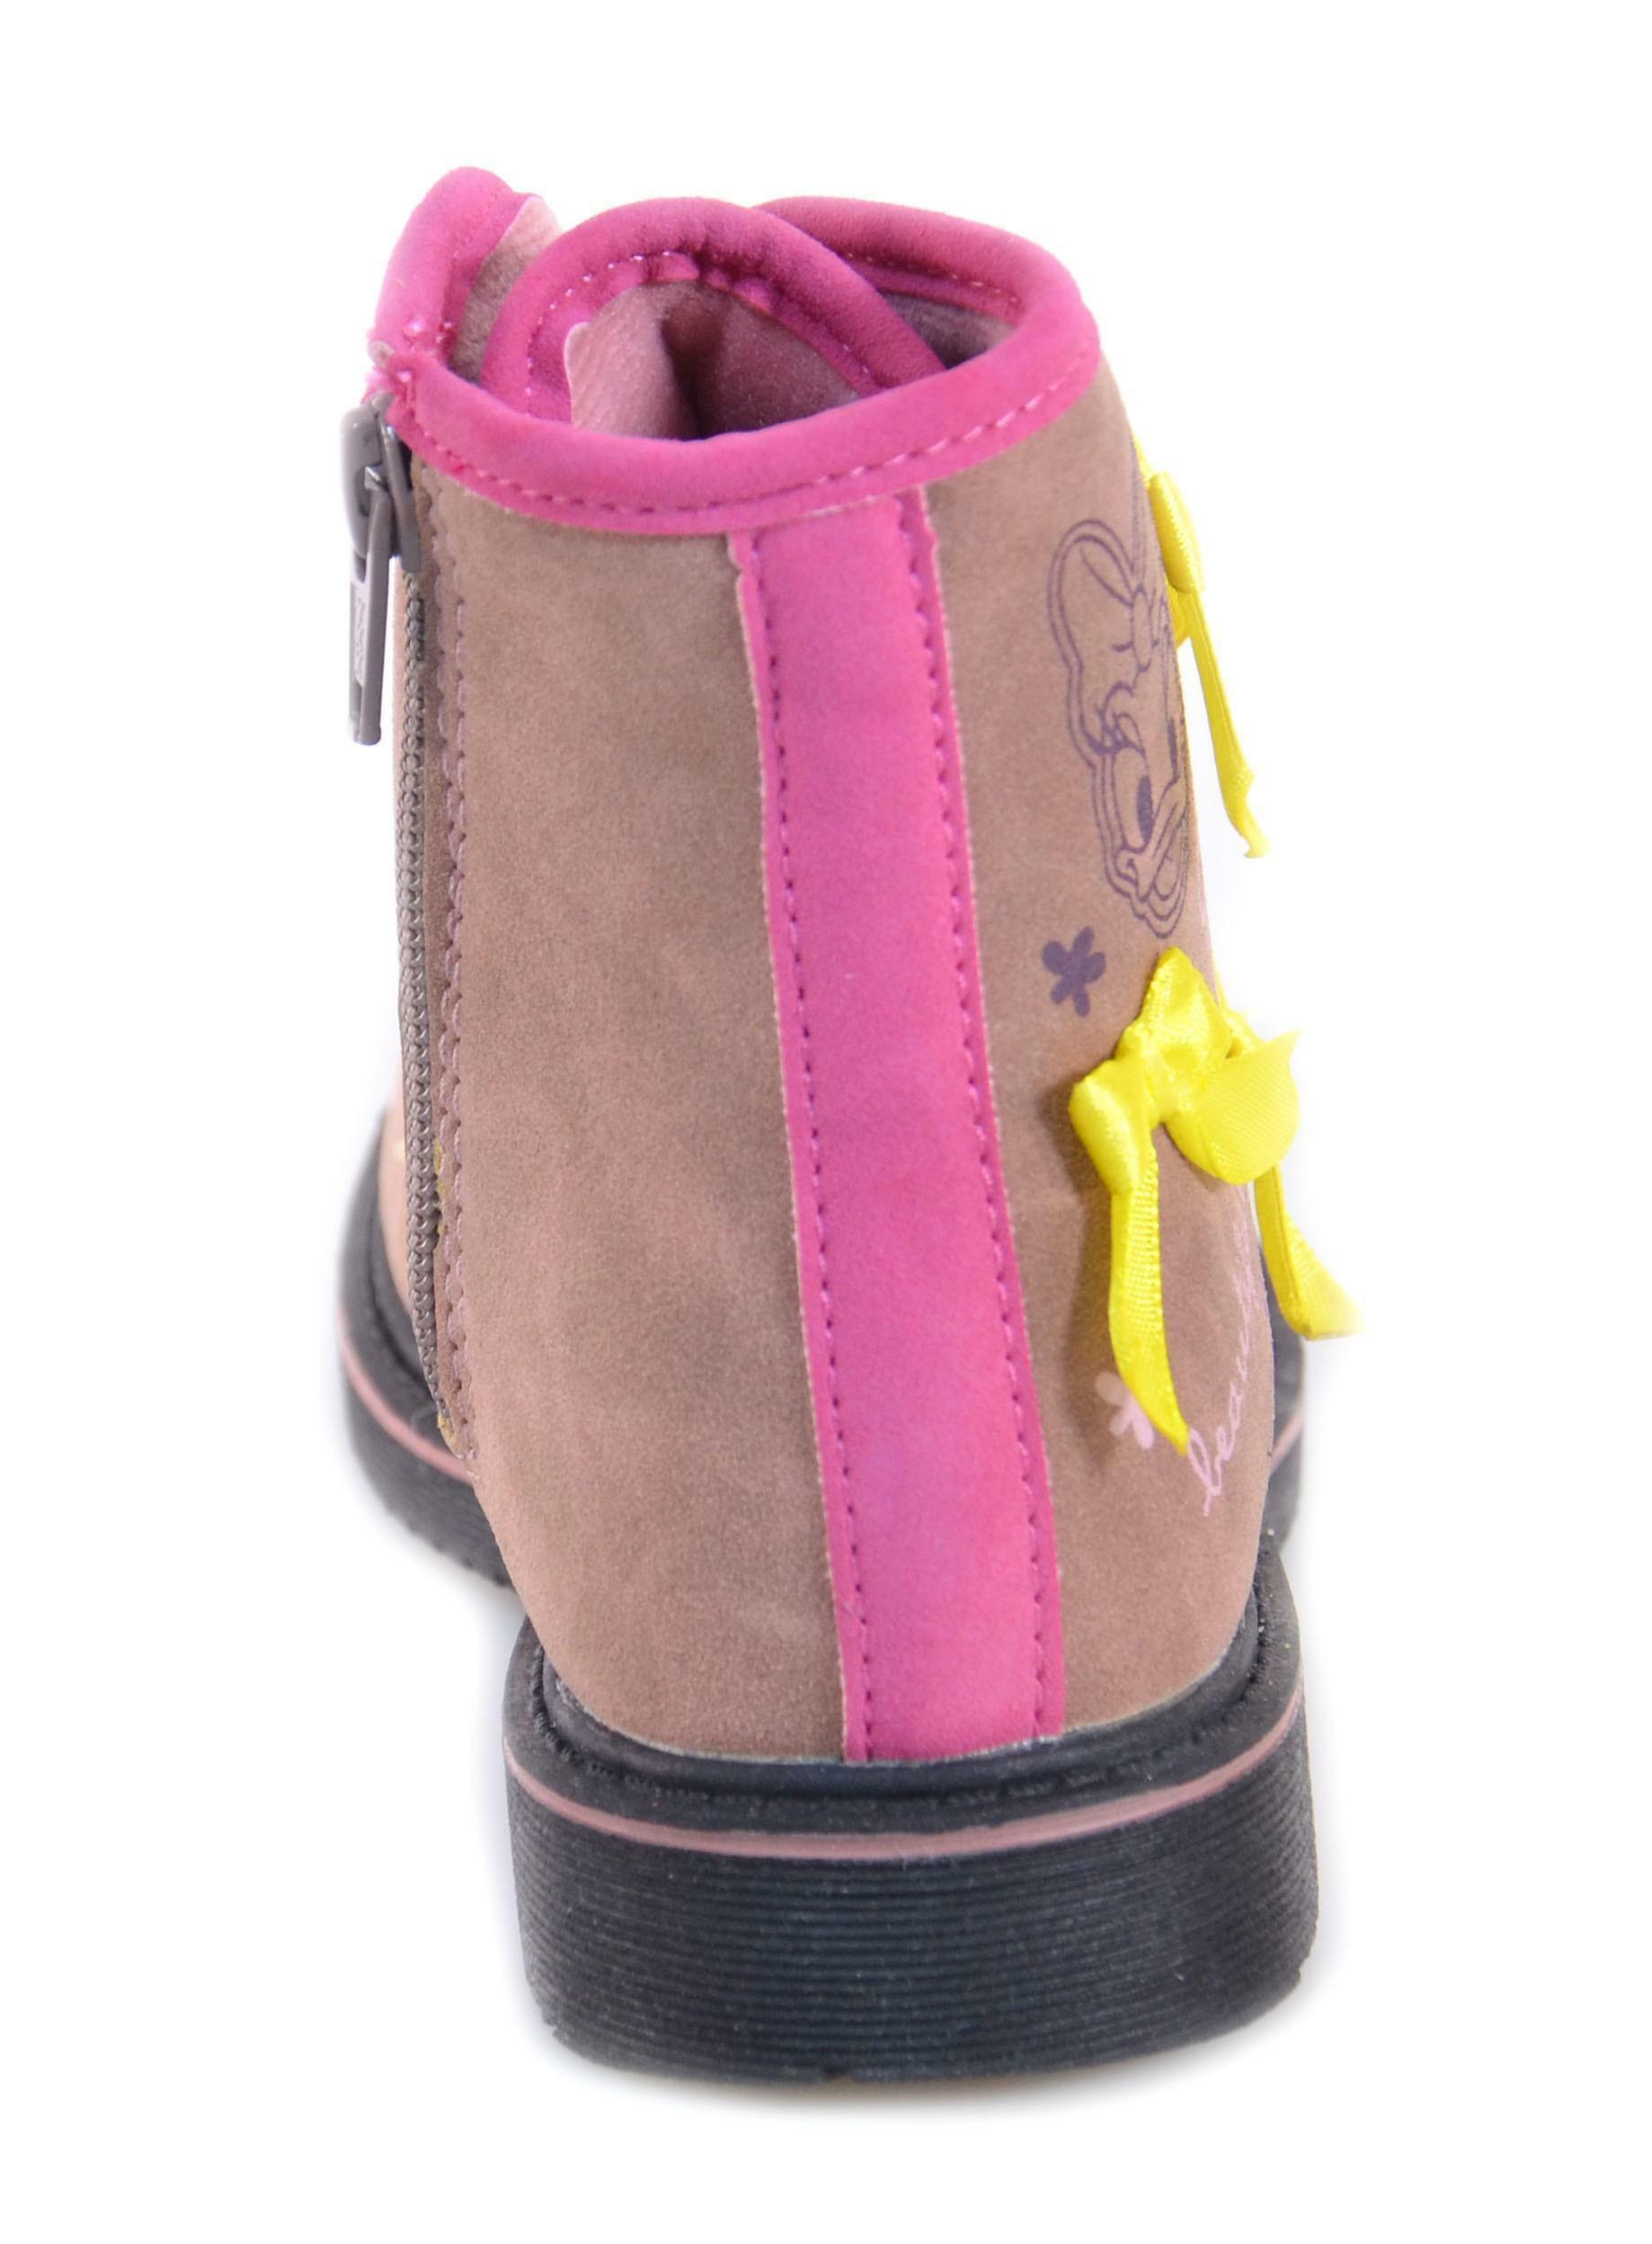 disney original marines scarponcino bambina rosa pelle lacci zip daib009